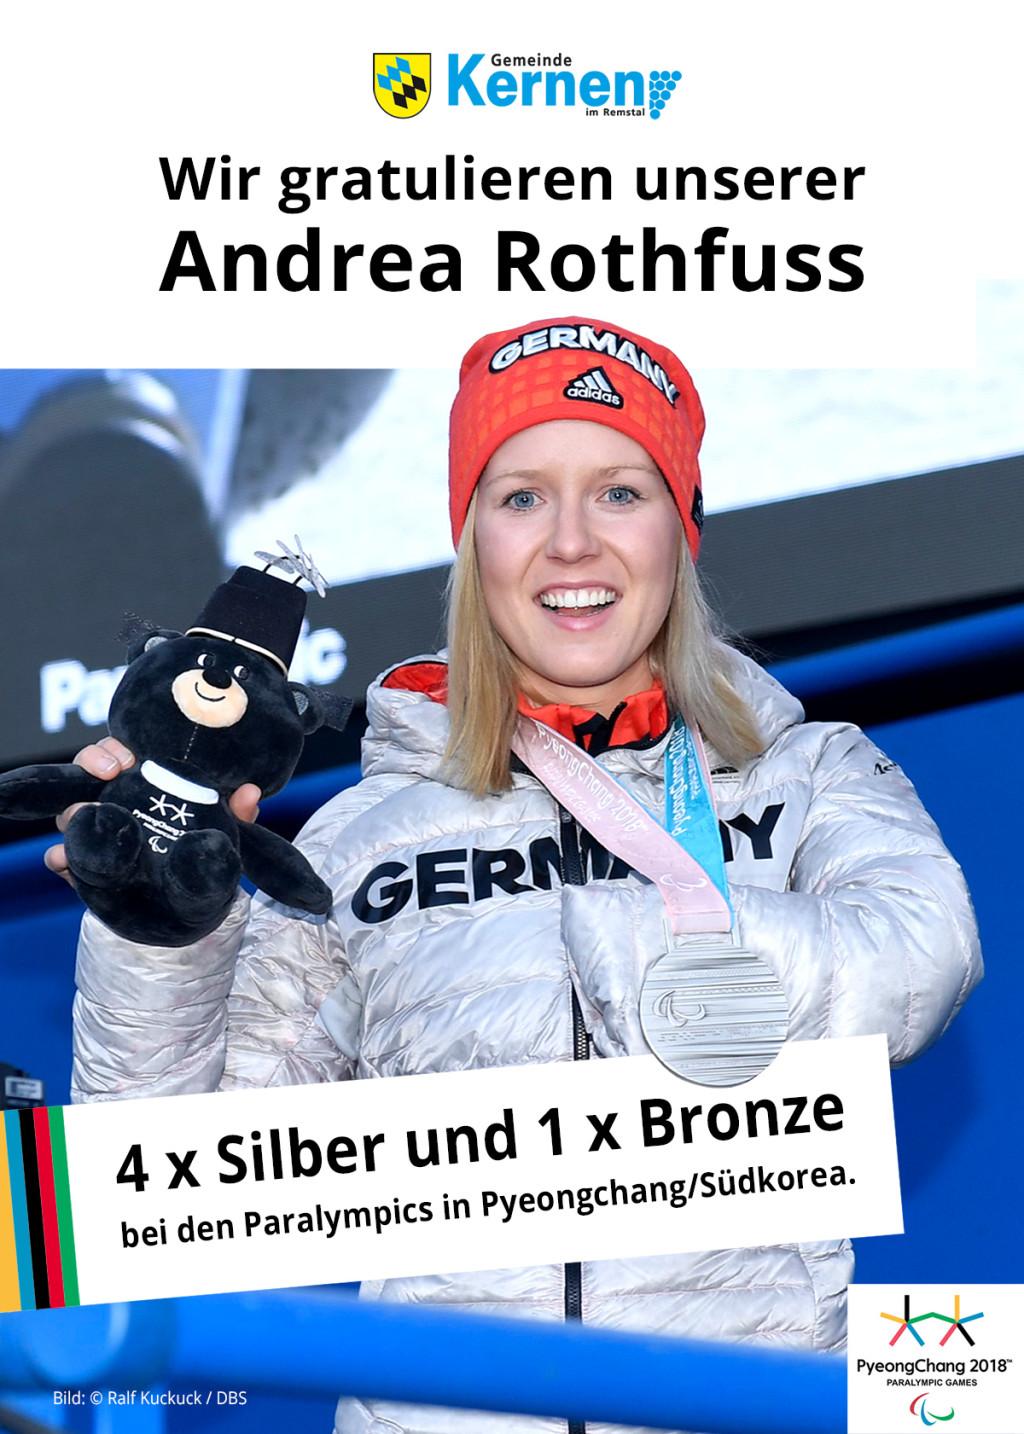 Gratulation an Andrea Rothfuss